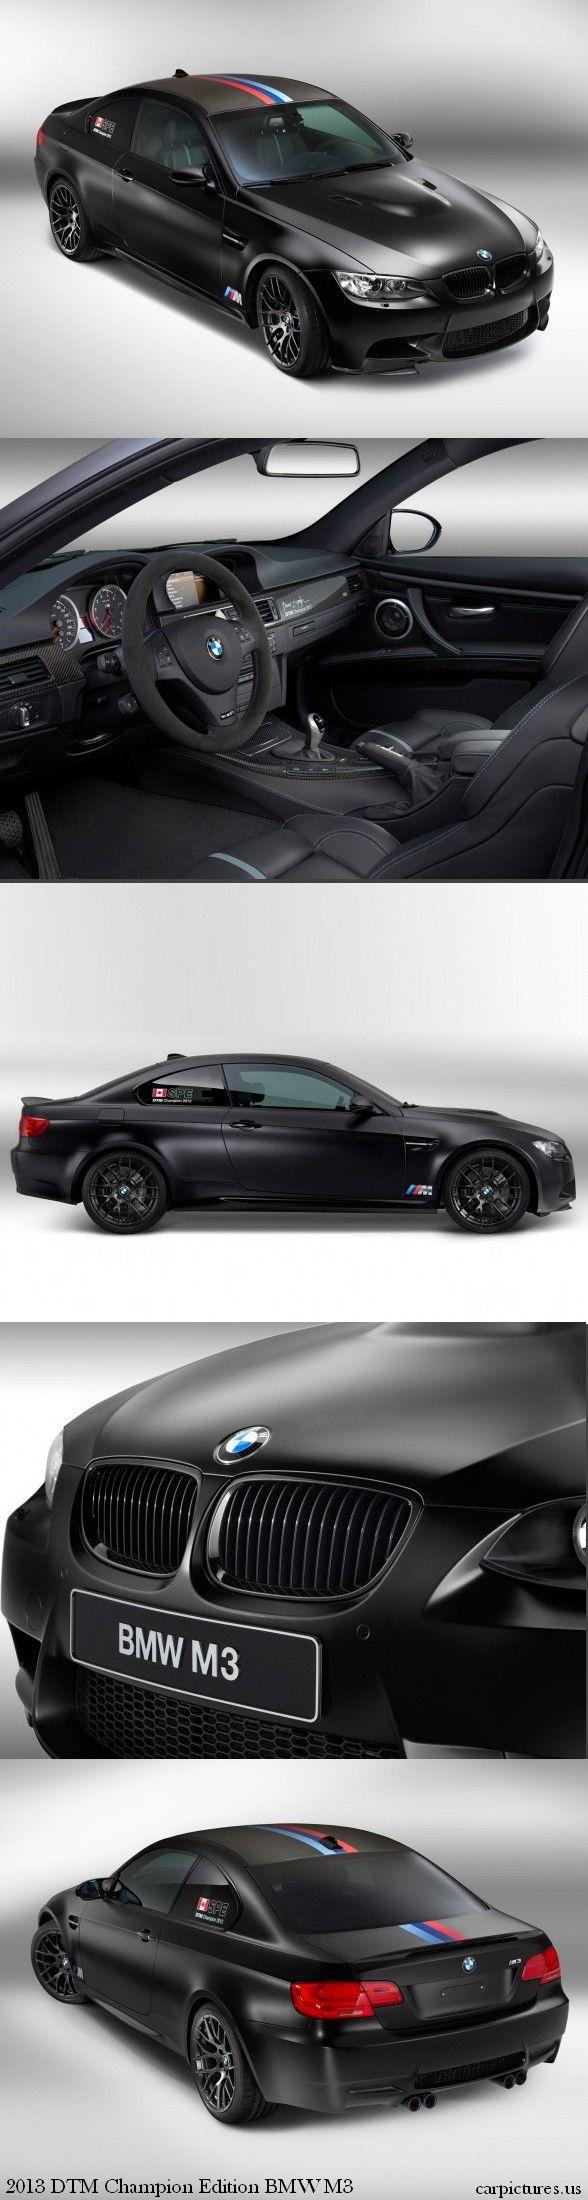 2013 BMW M3 M Sport Champion Edition